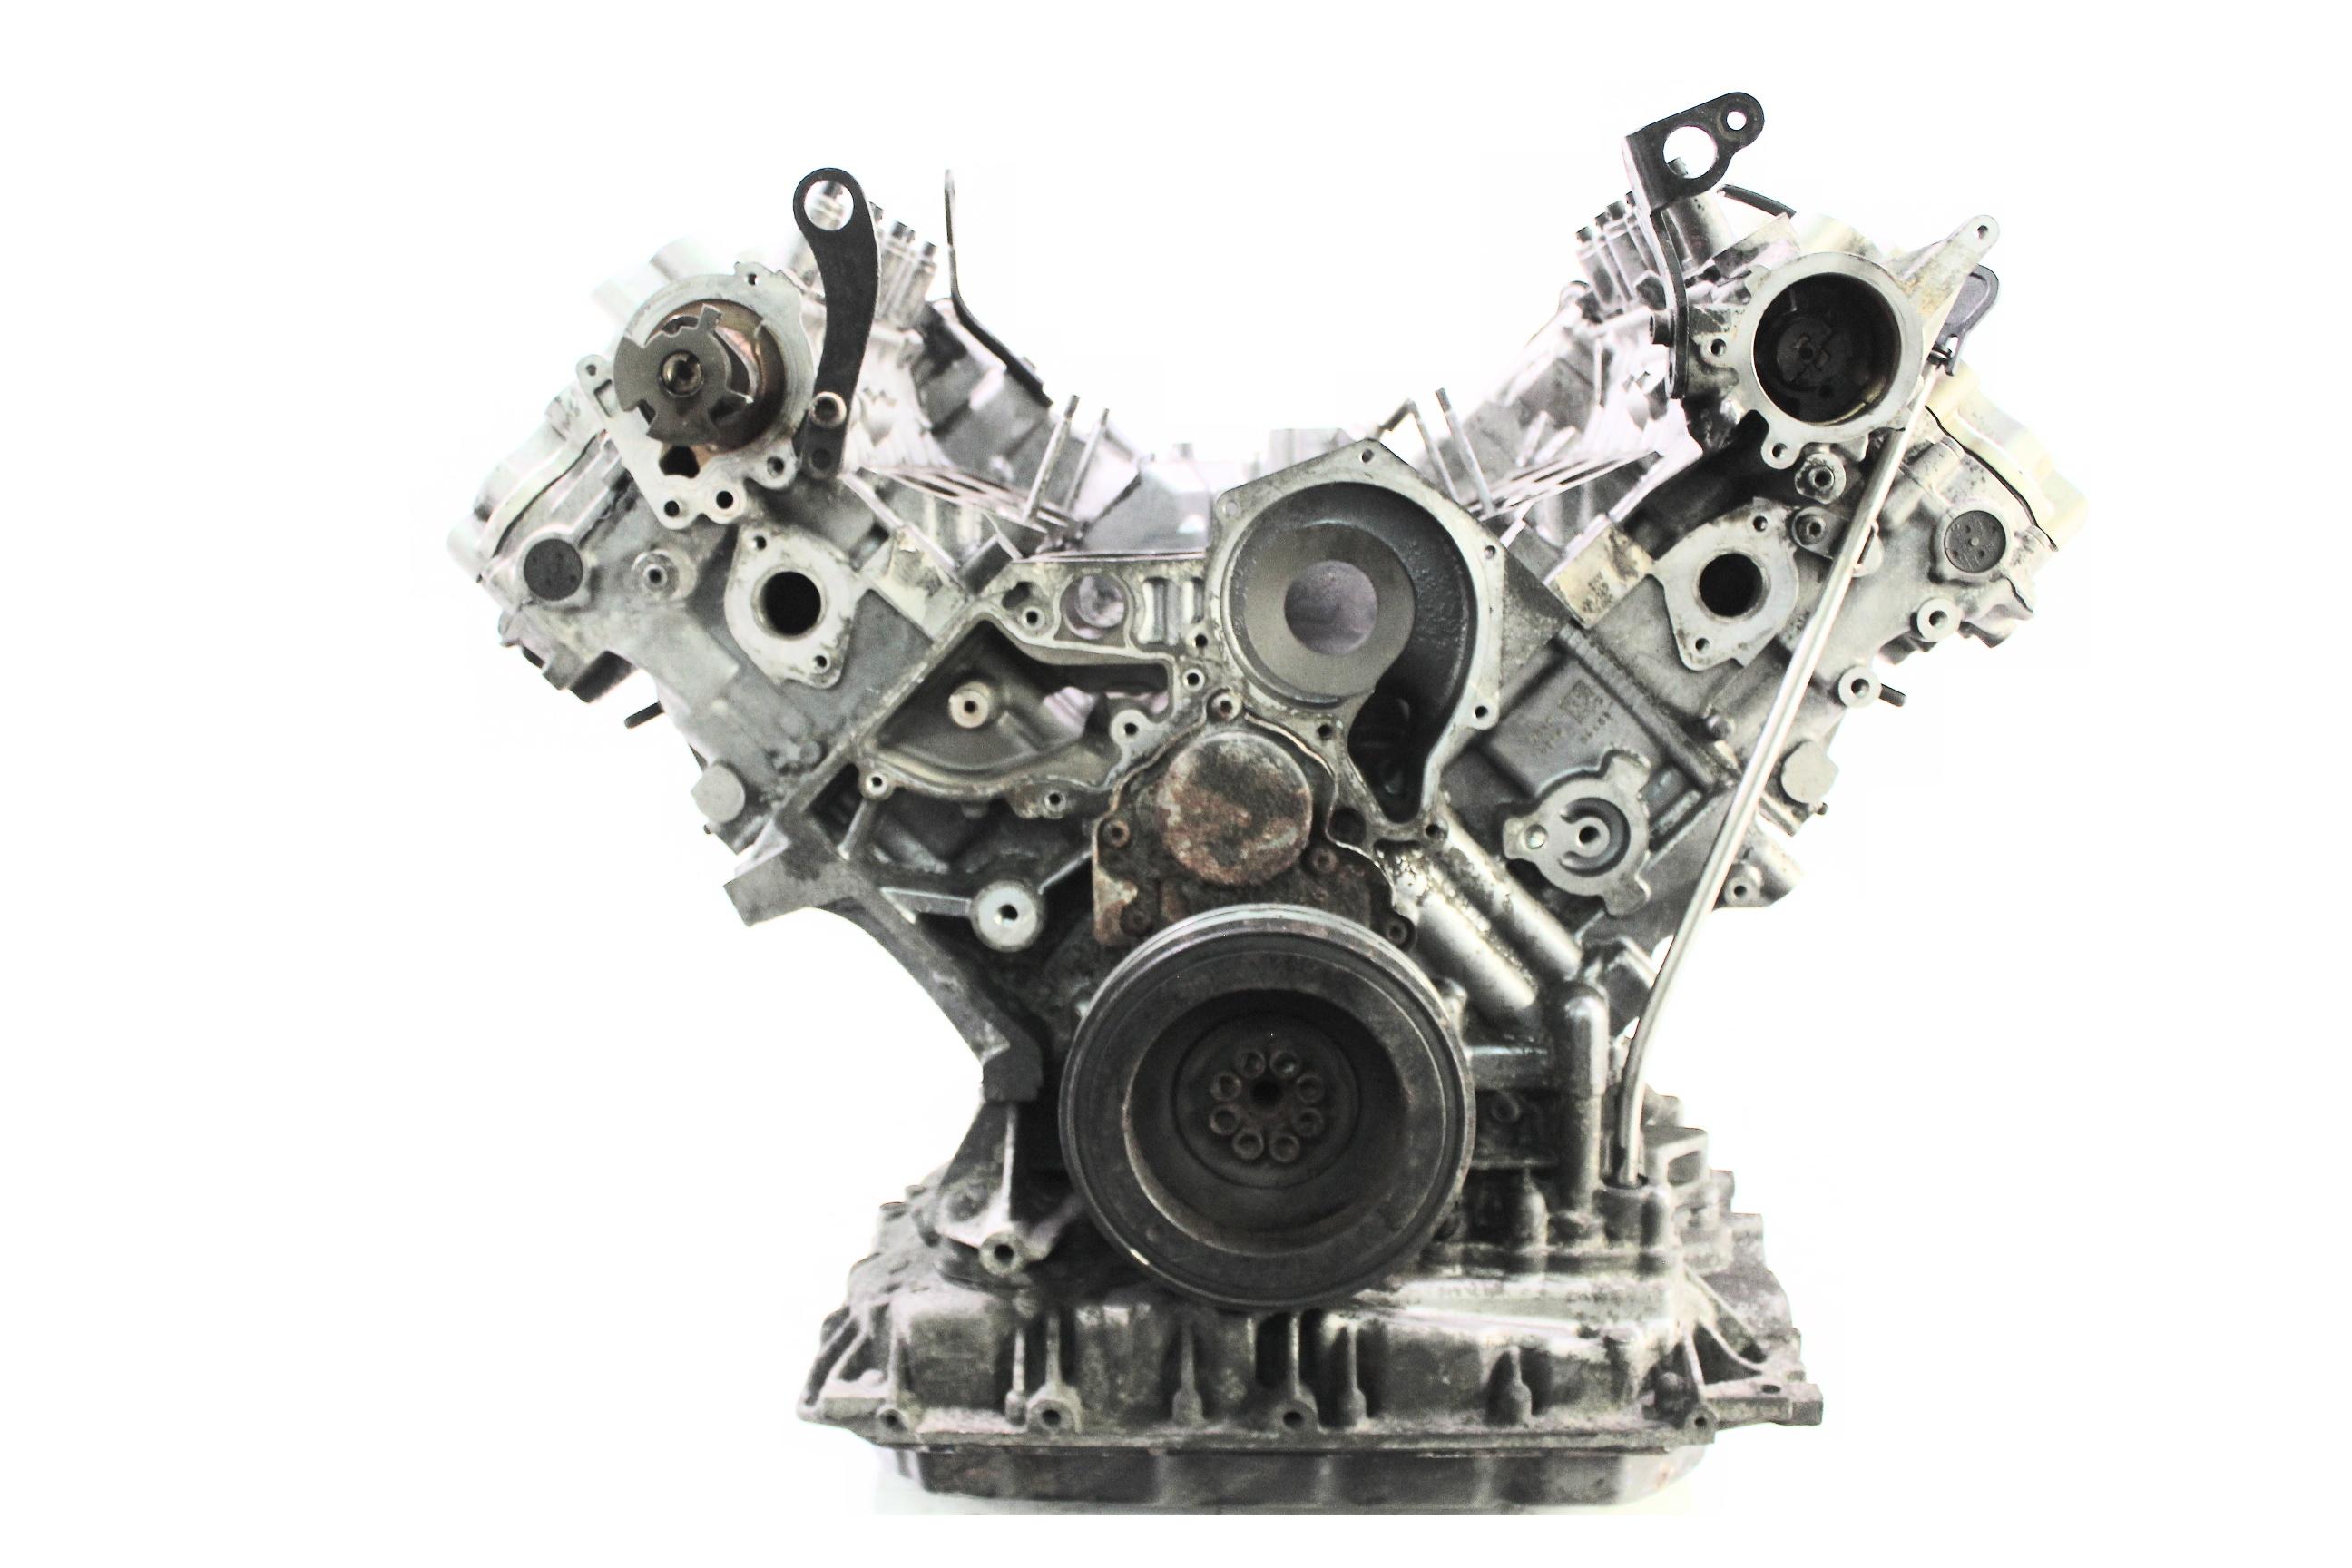 Motor 2010 Audi A4 A5 B8 A6 C6 3,2 FSI Benzin CALA CAL 265 PS